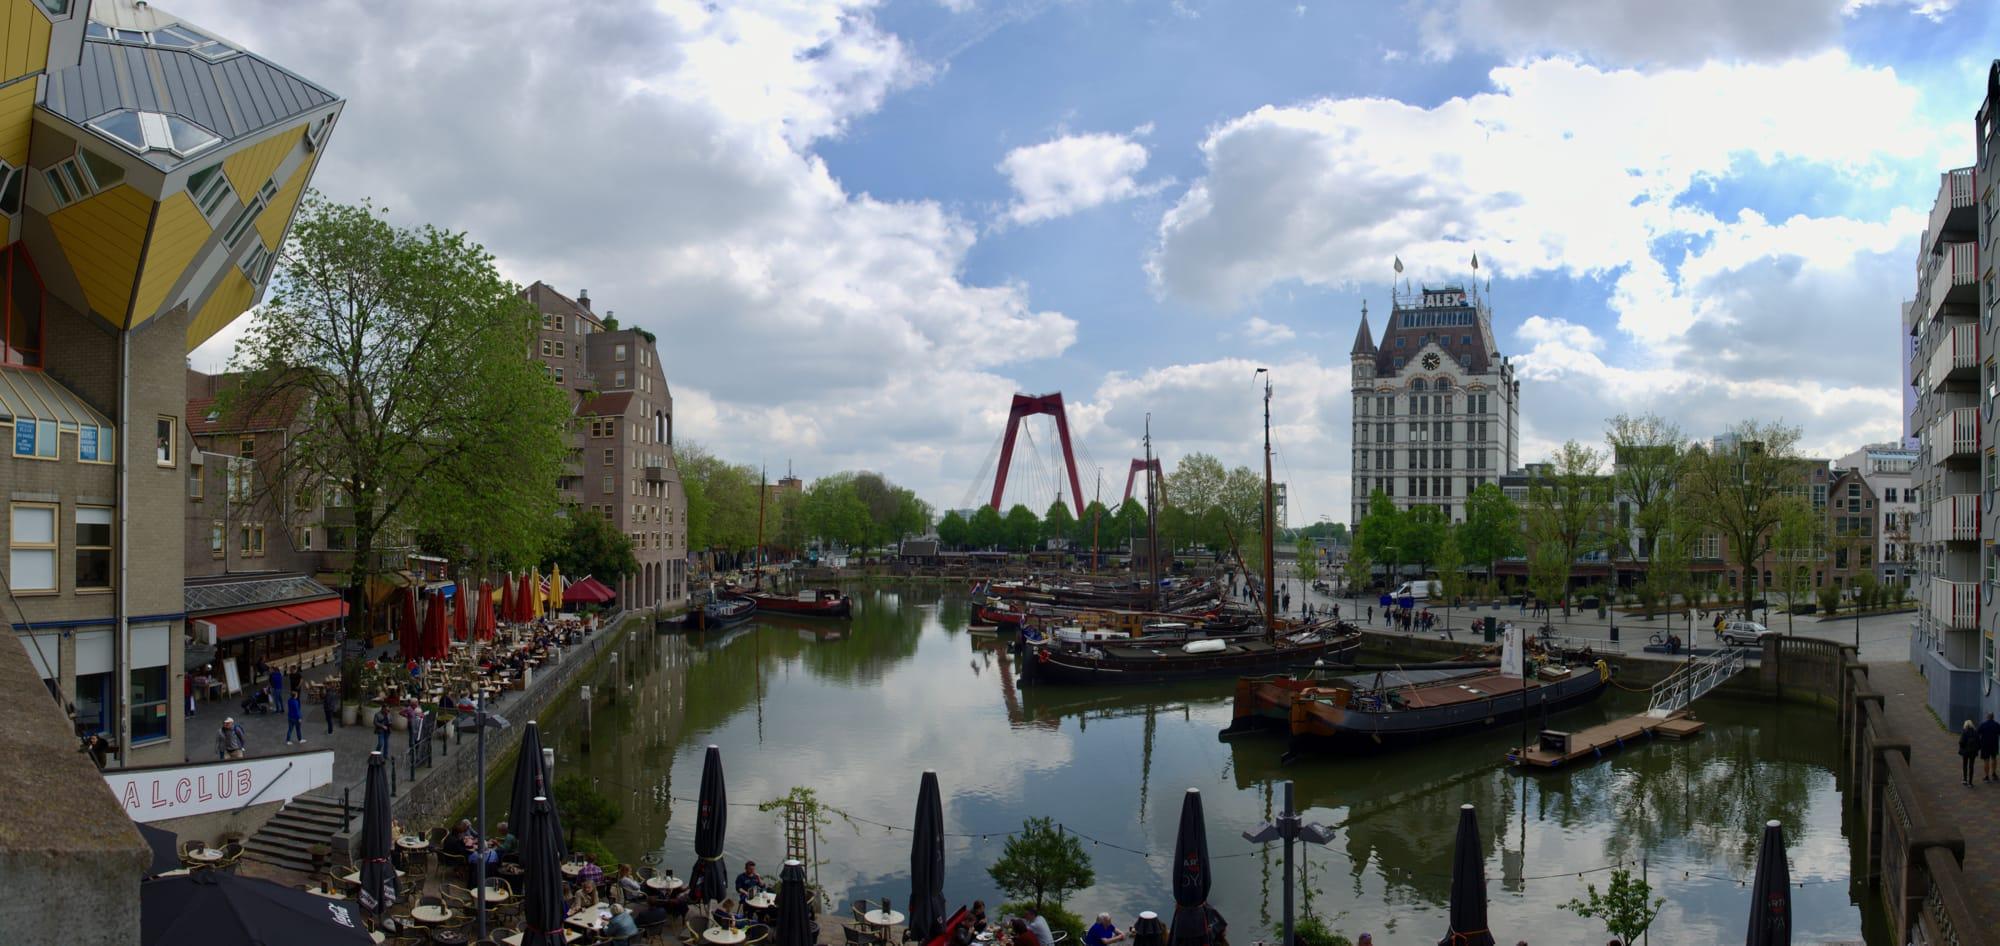 Rotterdam e Kinderdijk: l'architettura moderna e i tradizionali mulini